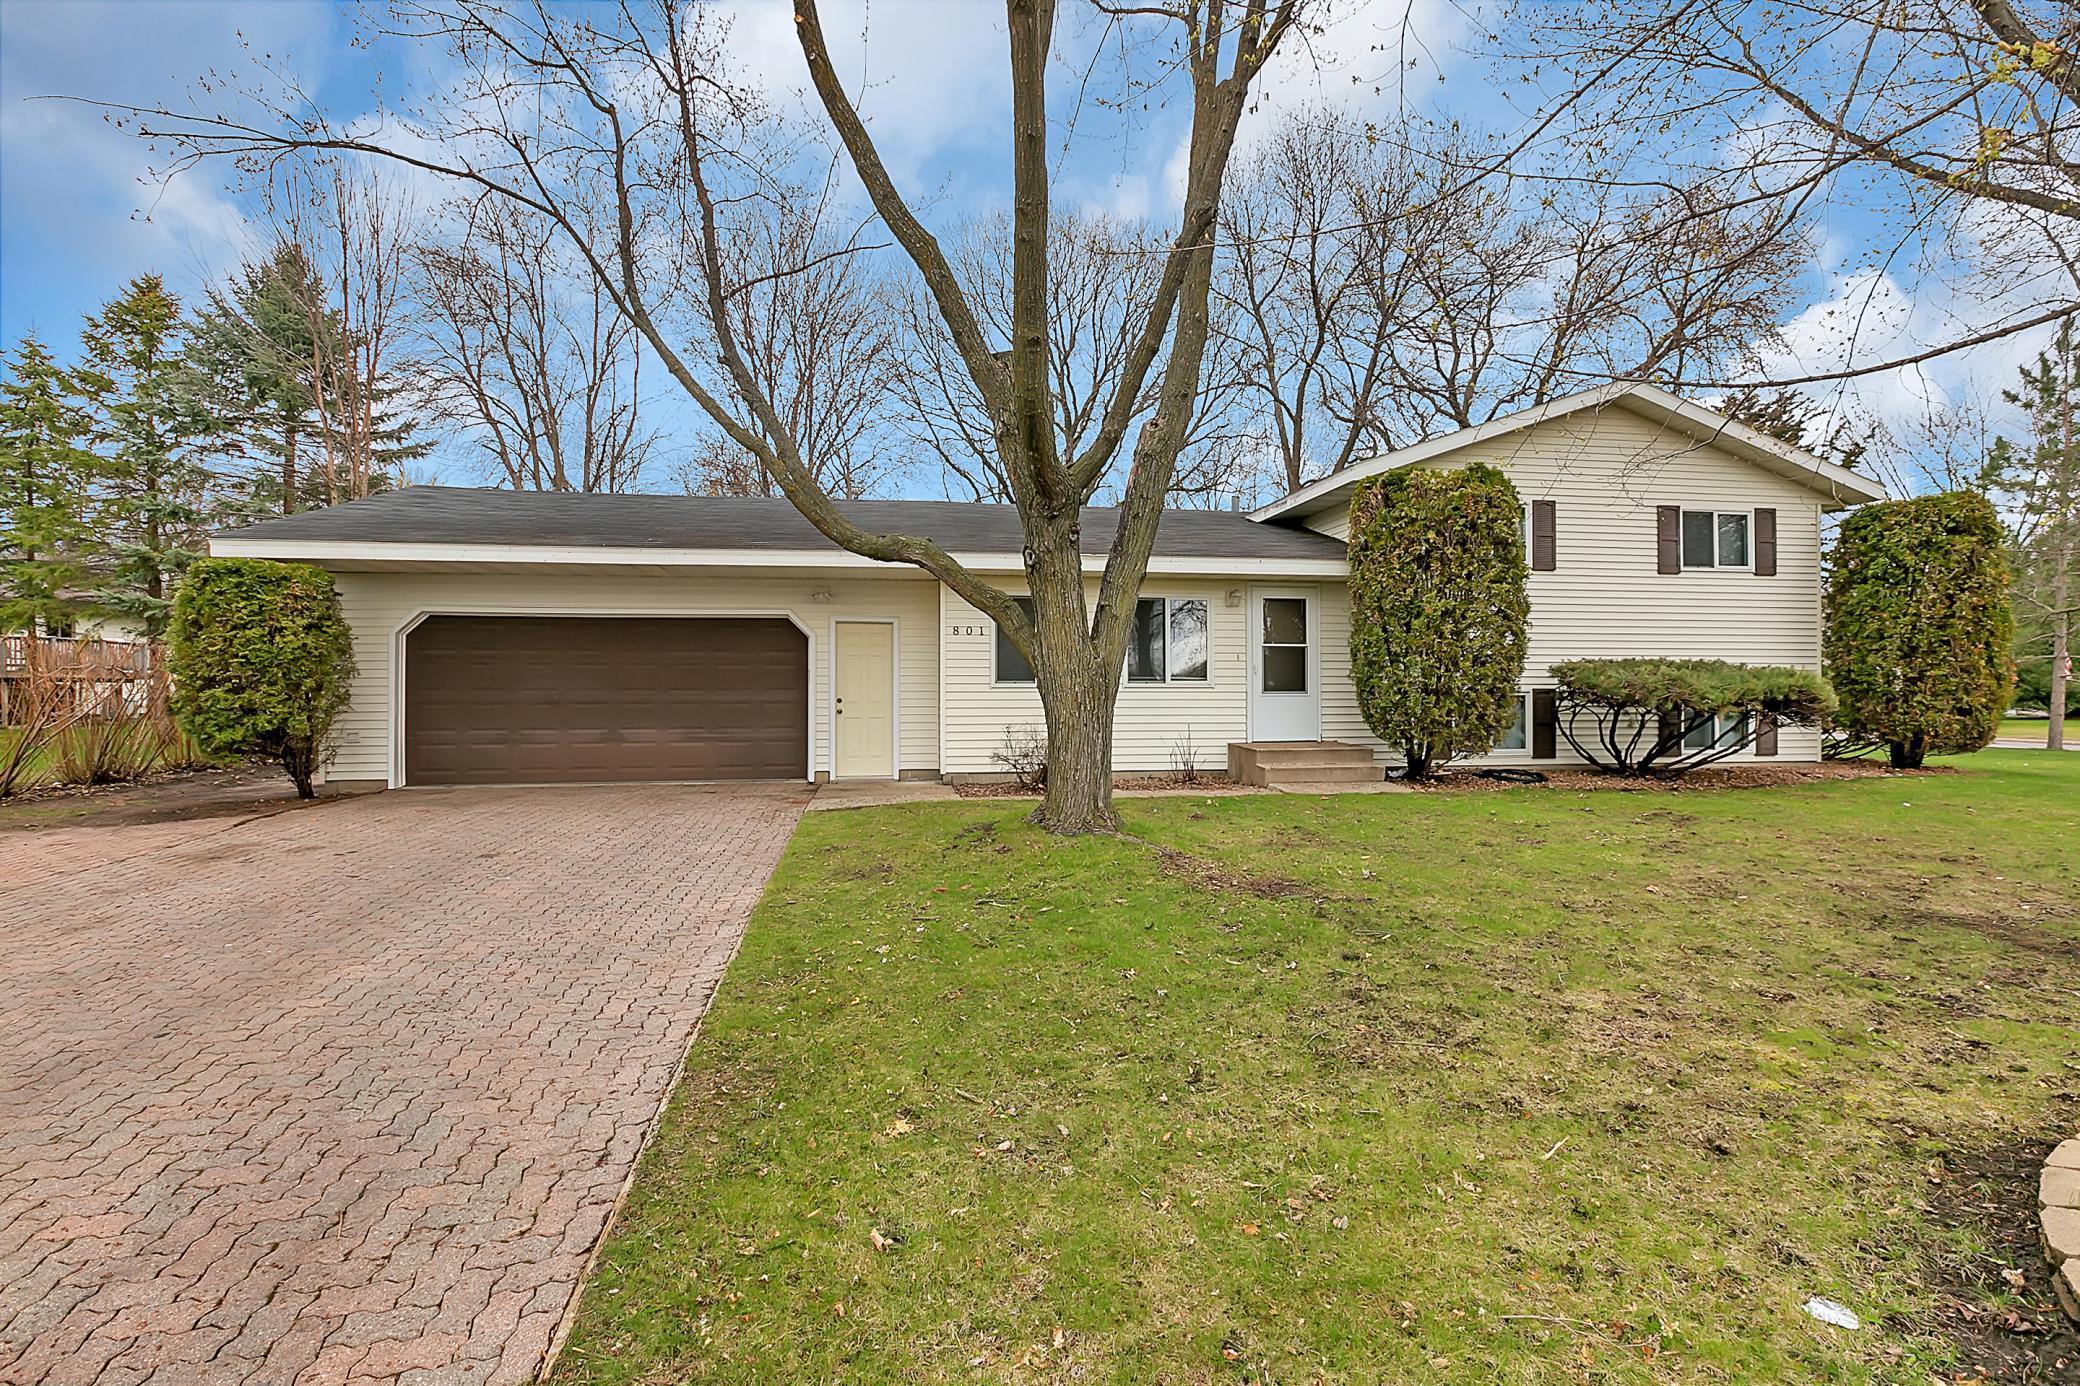 801 Maywood Drive, Saint Cloud MN 56303 - Photo 1